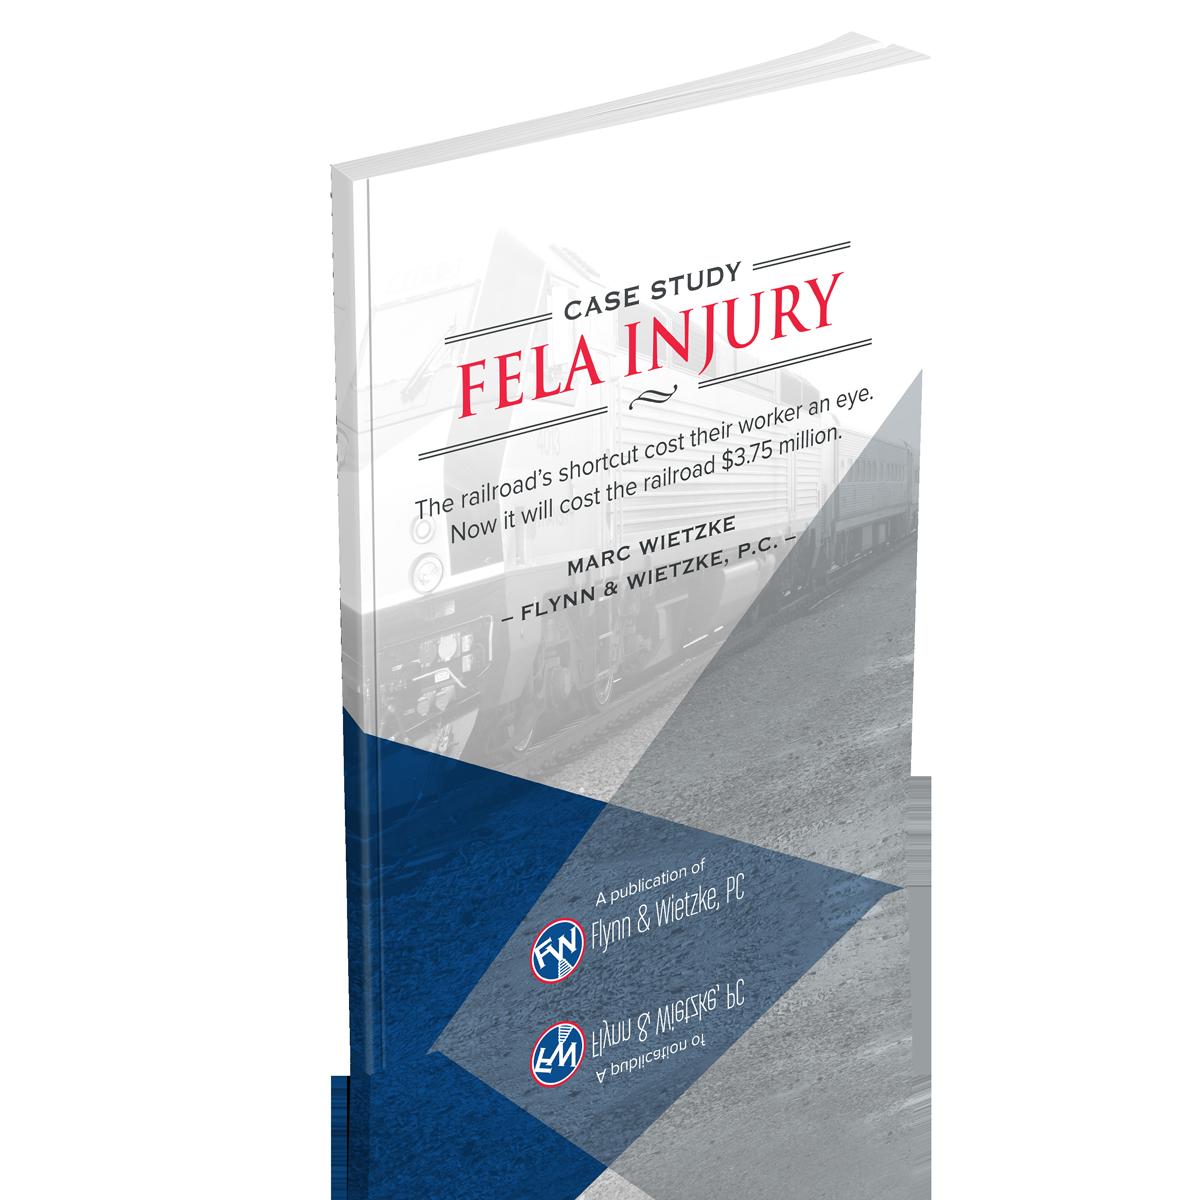 FELA_Injury_Case_Study_Mockup_v2.png